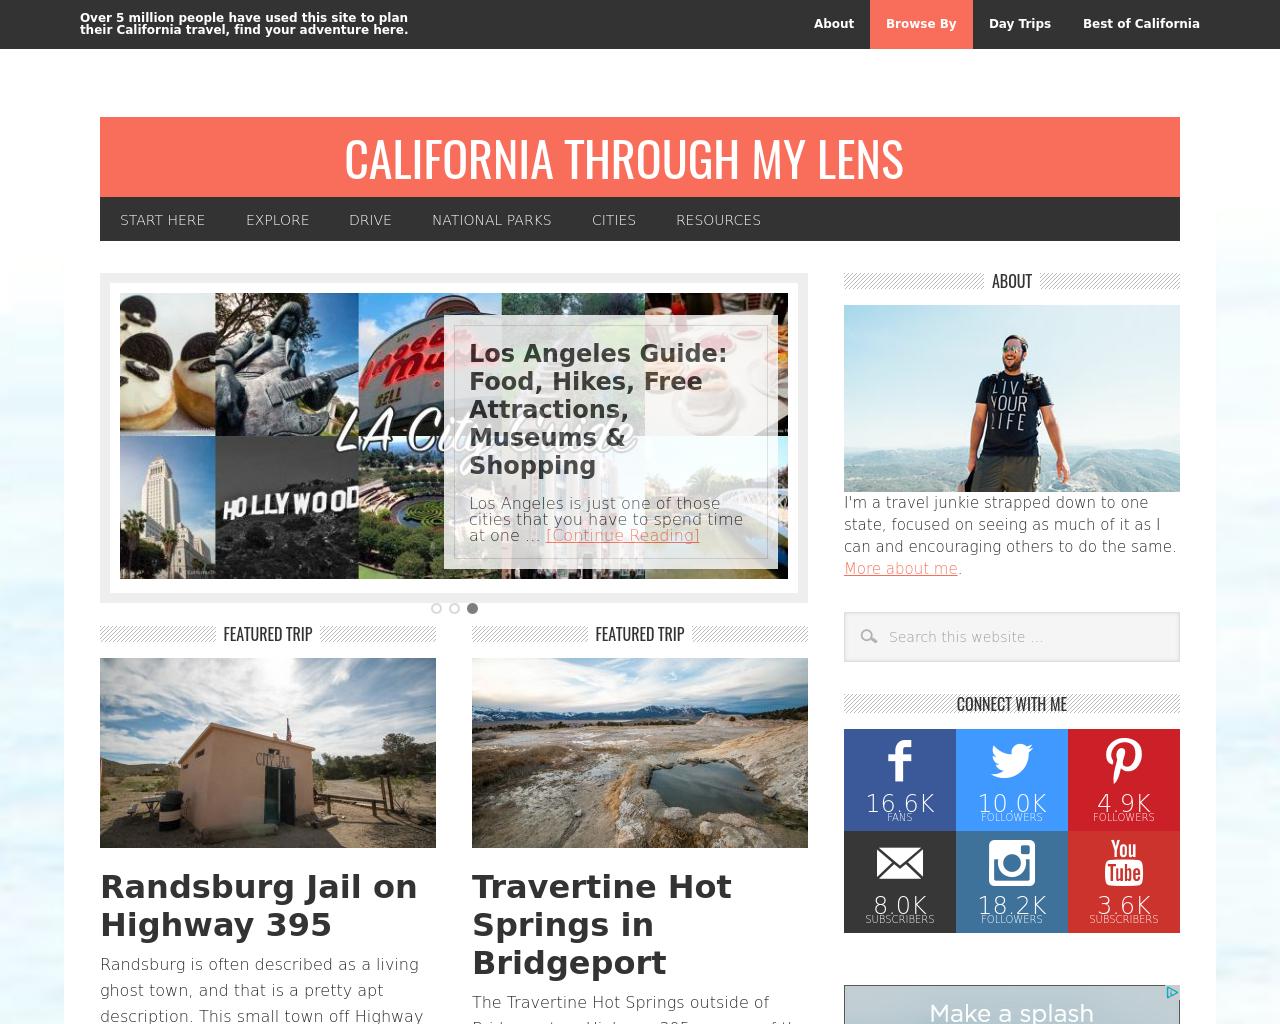 California-Through-My-Lens-Advertising-Reviews-Pricing